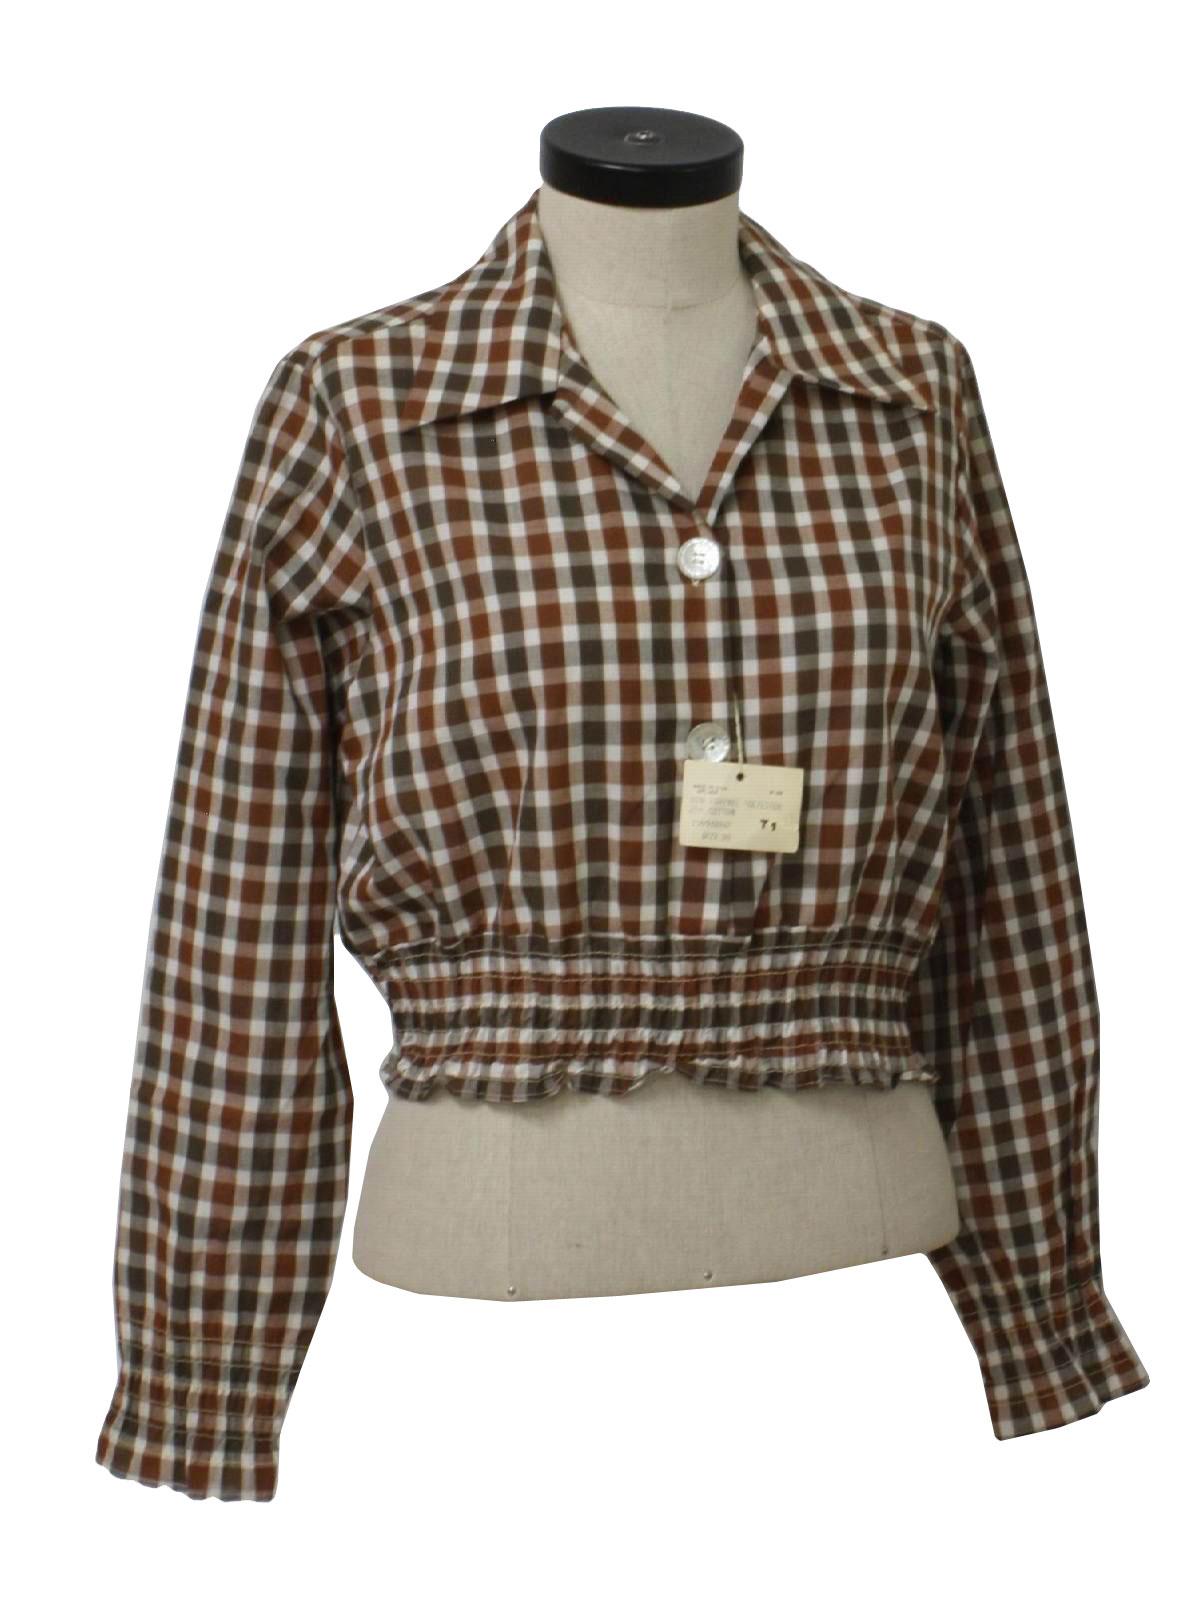 1970 39 s vintage wrangler western shirt early 70s wrangler for Ladies brown check shirt